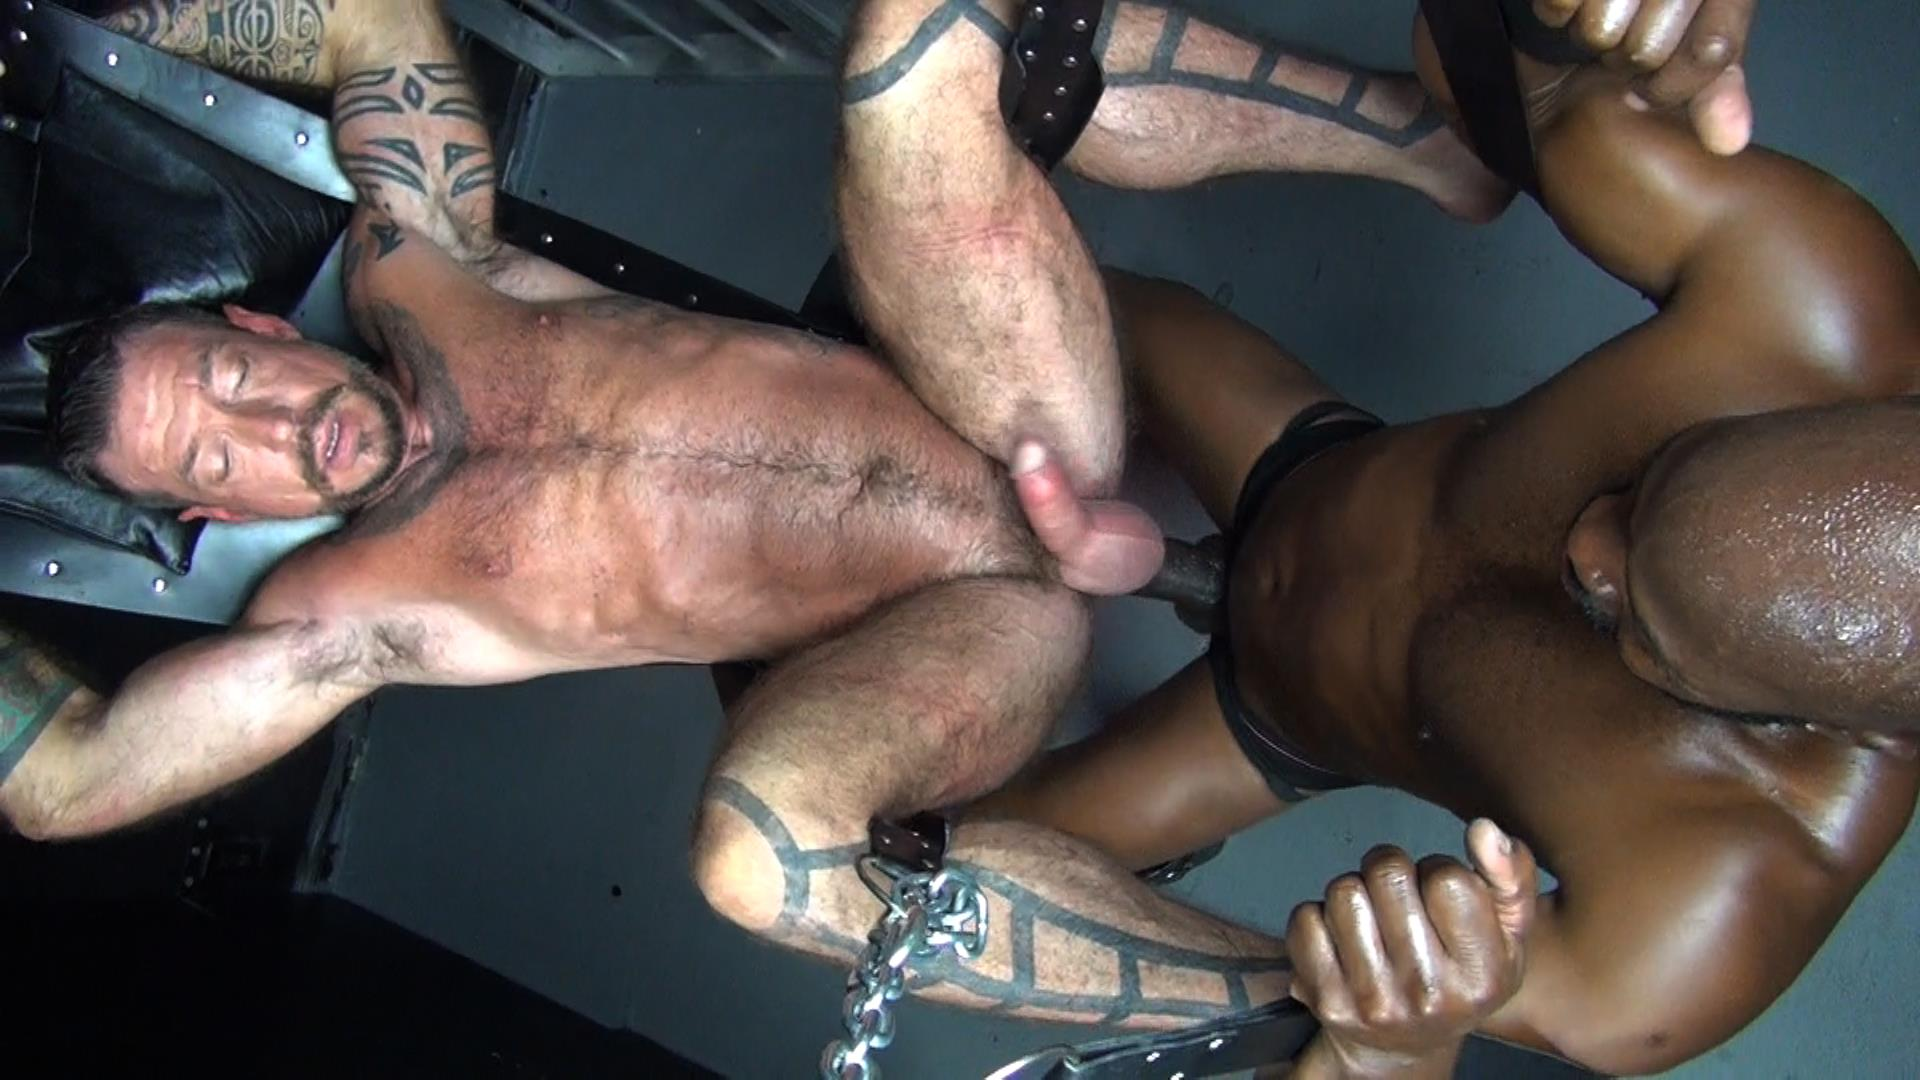 Raw Fuck Club Cutler X and Ray Dalton Interracial Bareback Sex Amateur Gay Porn 2 Cutler X Barebacking Hairy Muscle Daddy Ray Dalton With His Big Black Cock